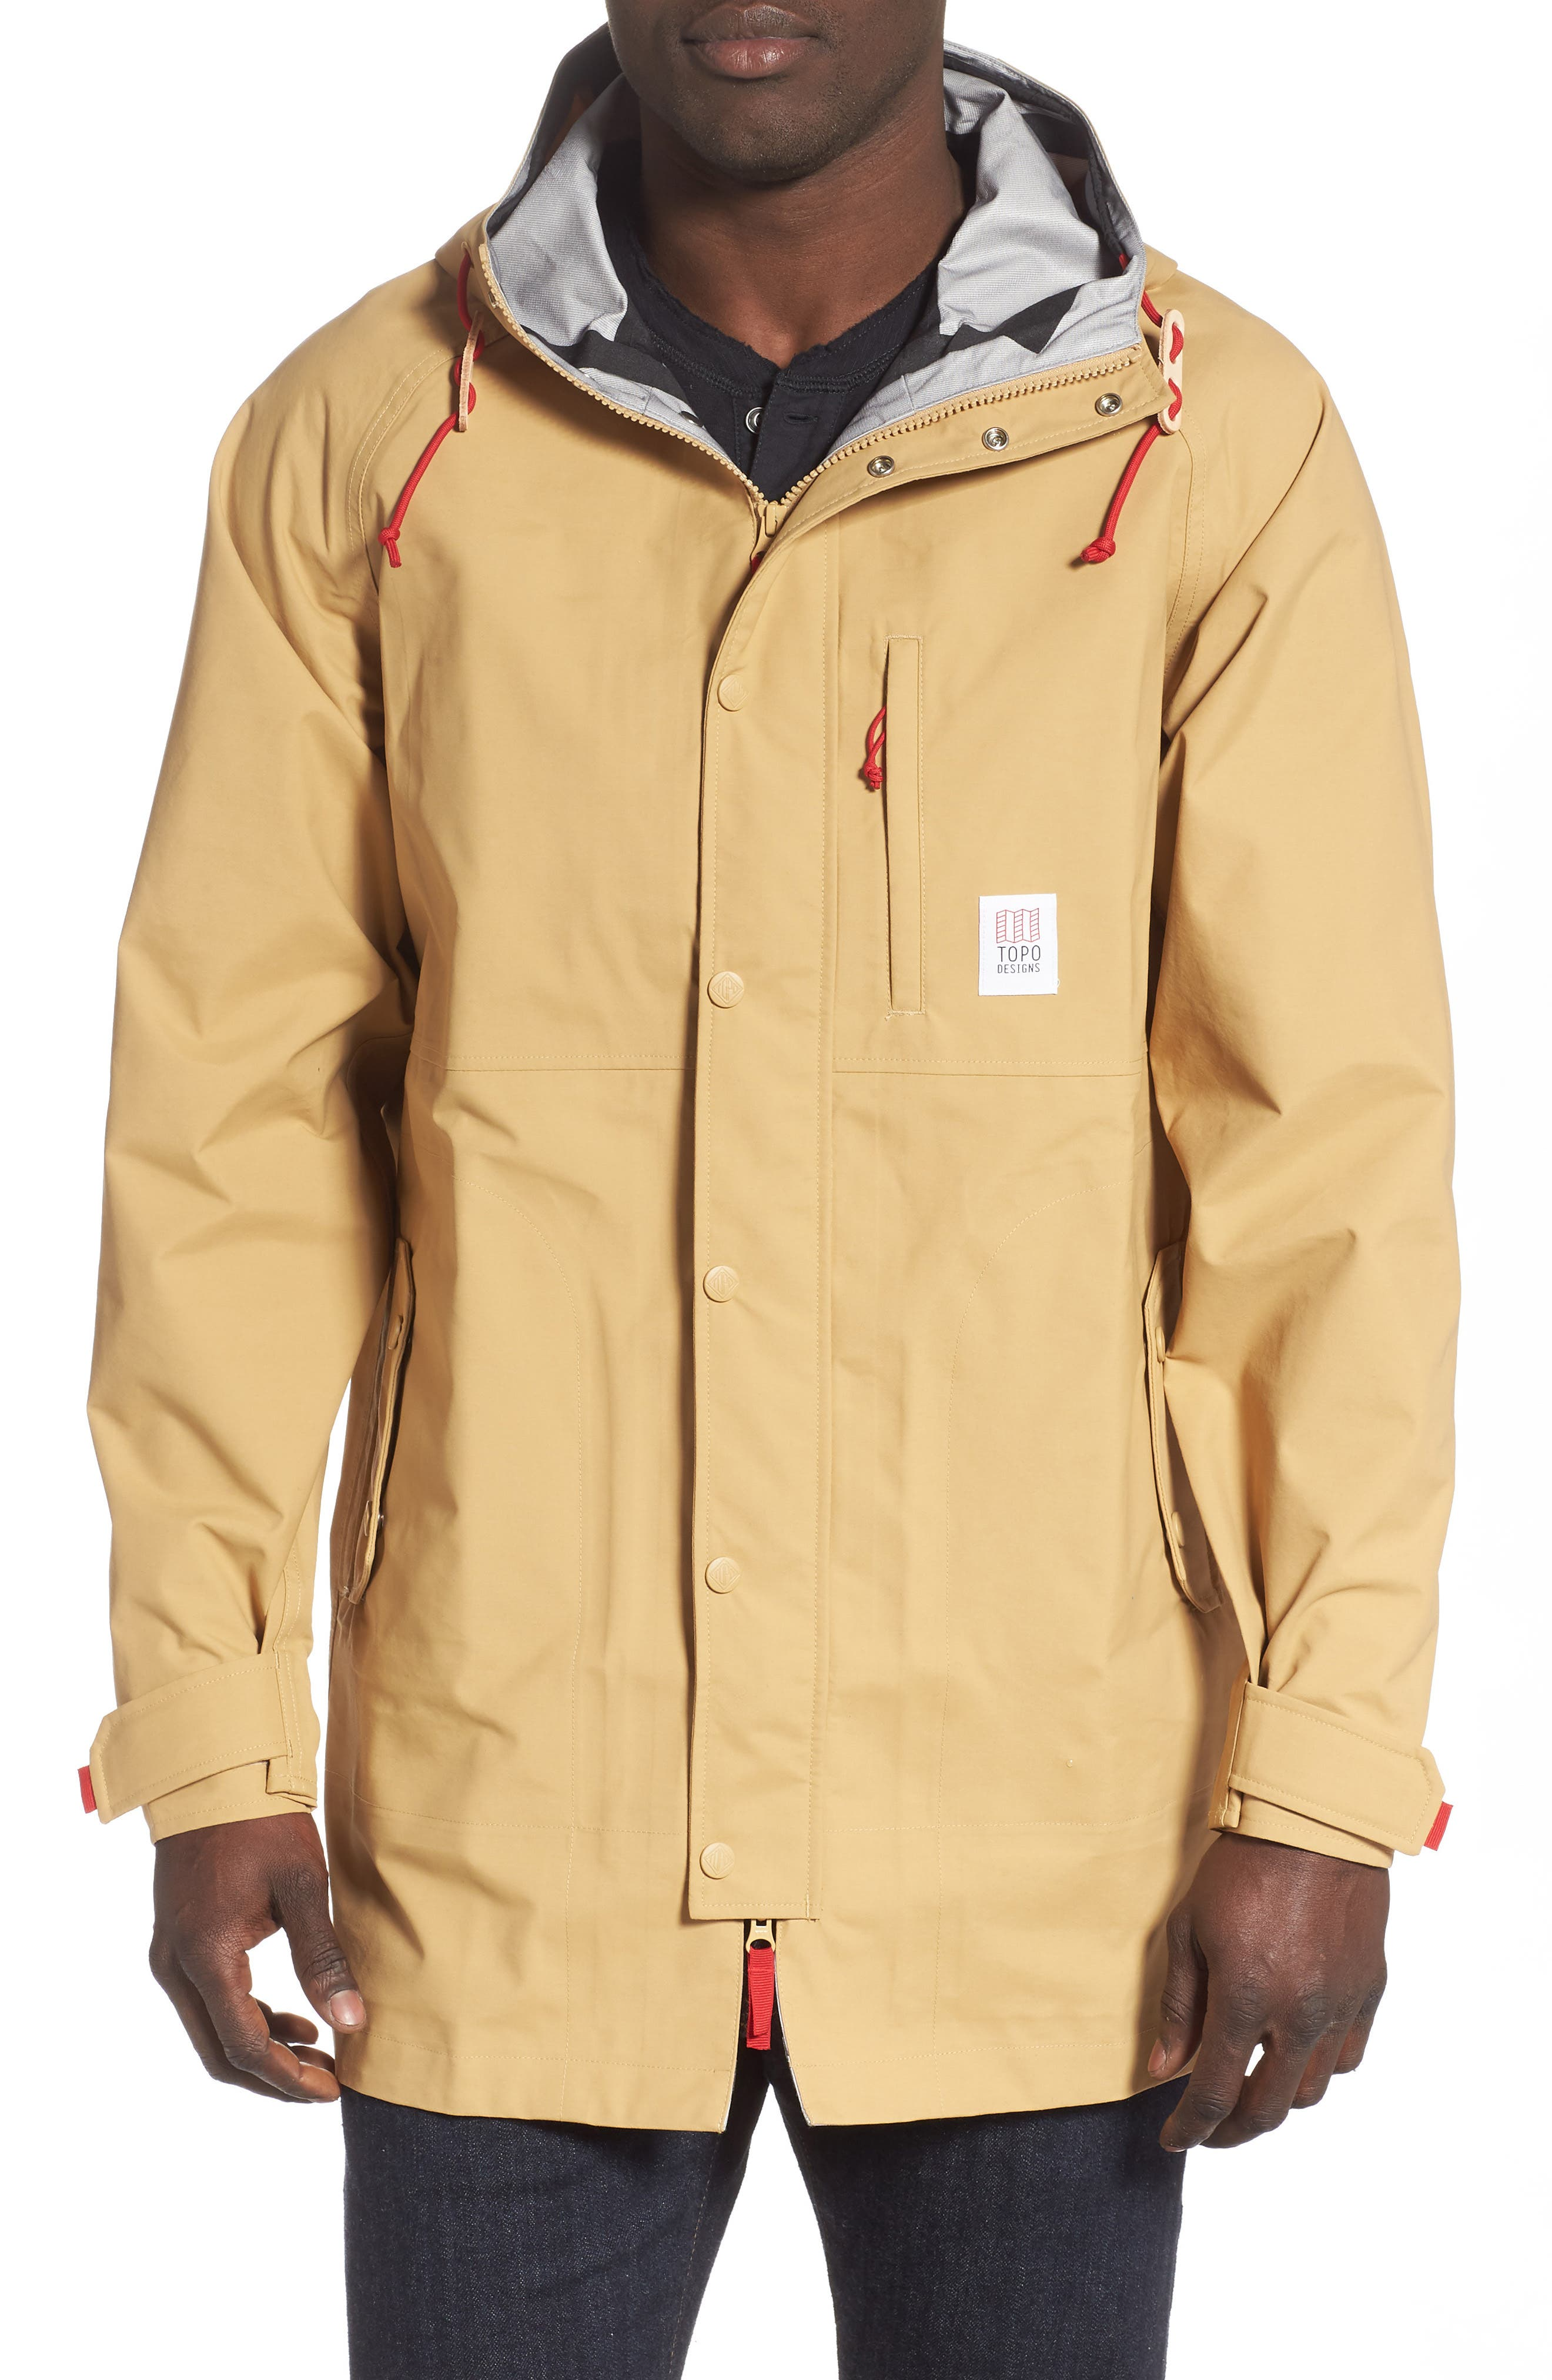 Topo Designs Waterproof Rain Jacket, Beige